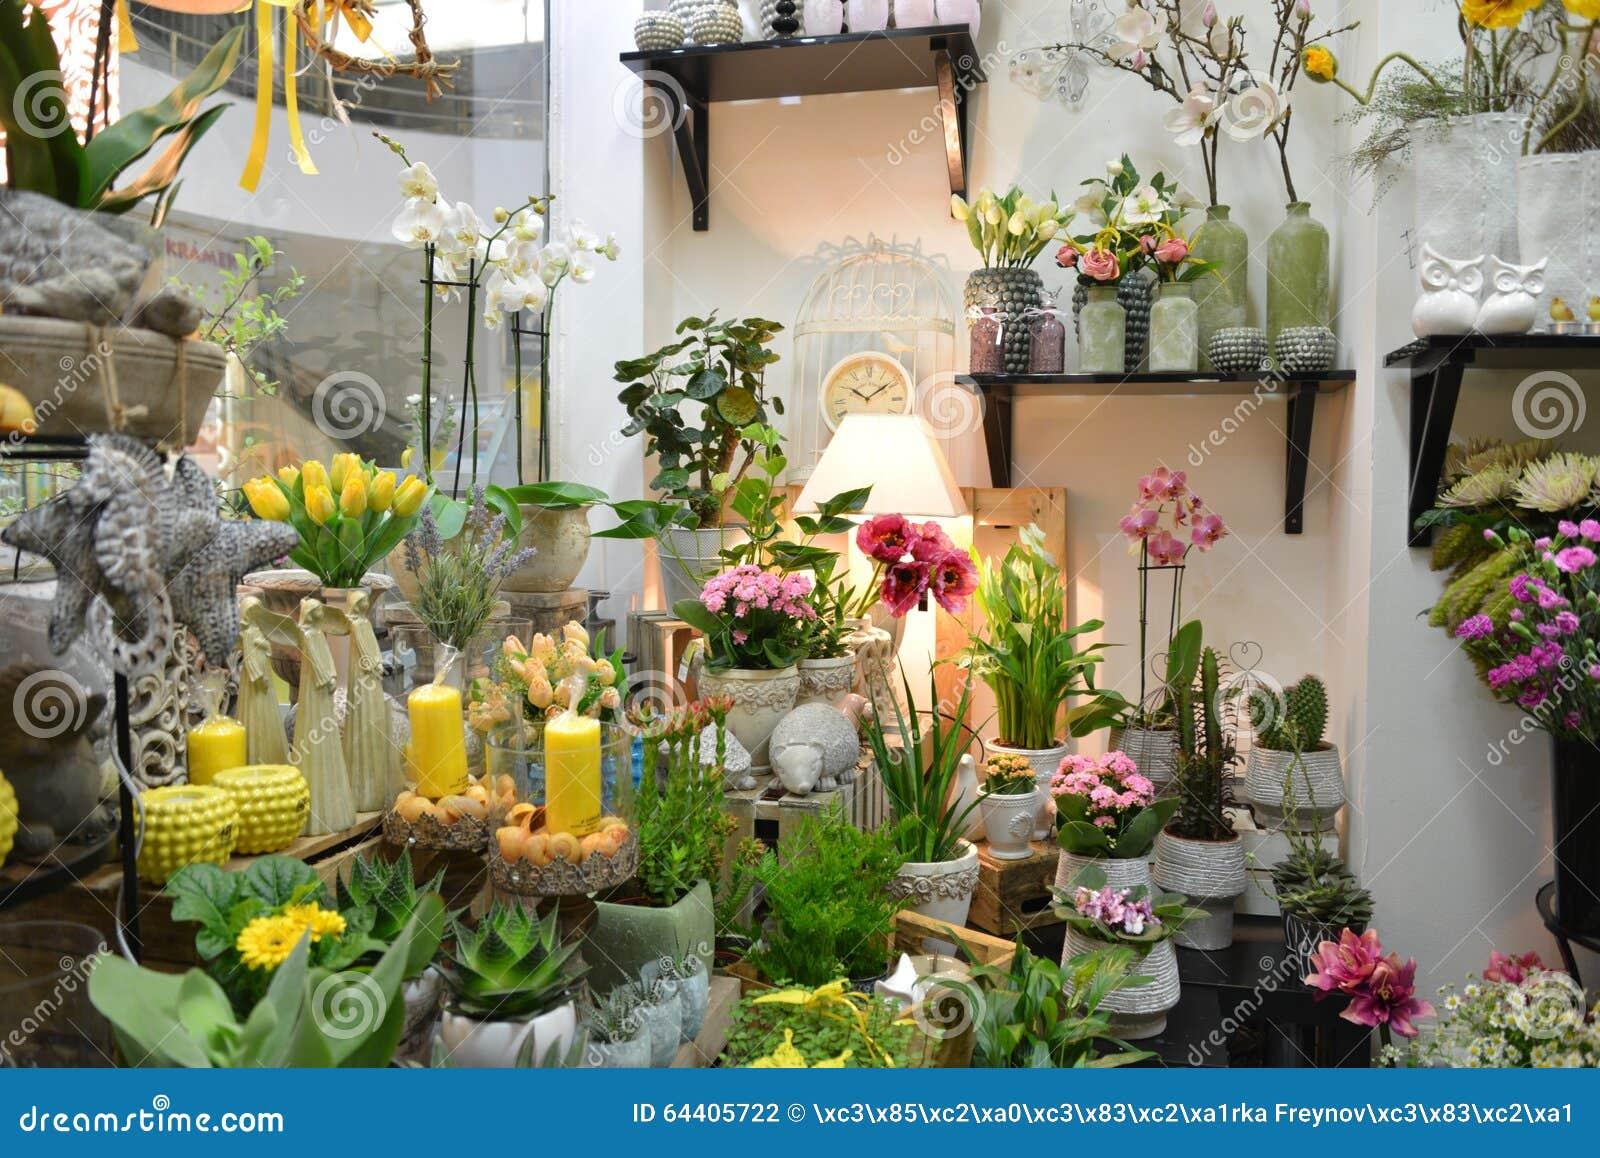 Flower shop stock photo image 64405722 for Designs east florist interior